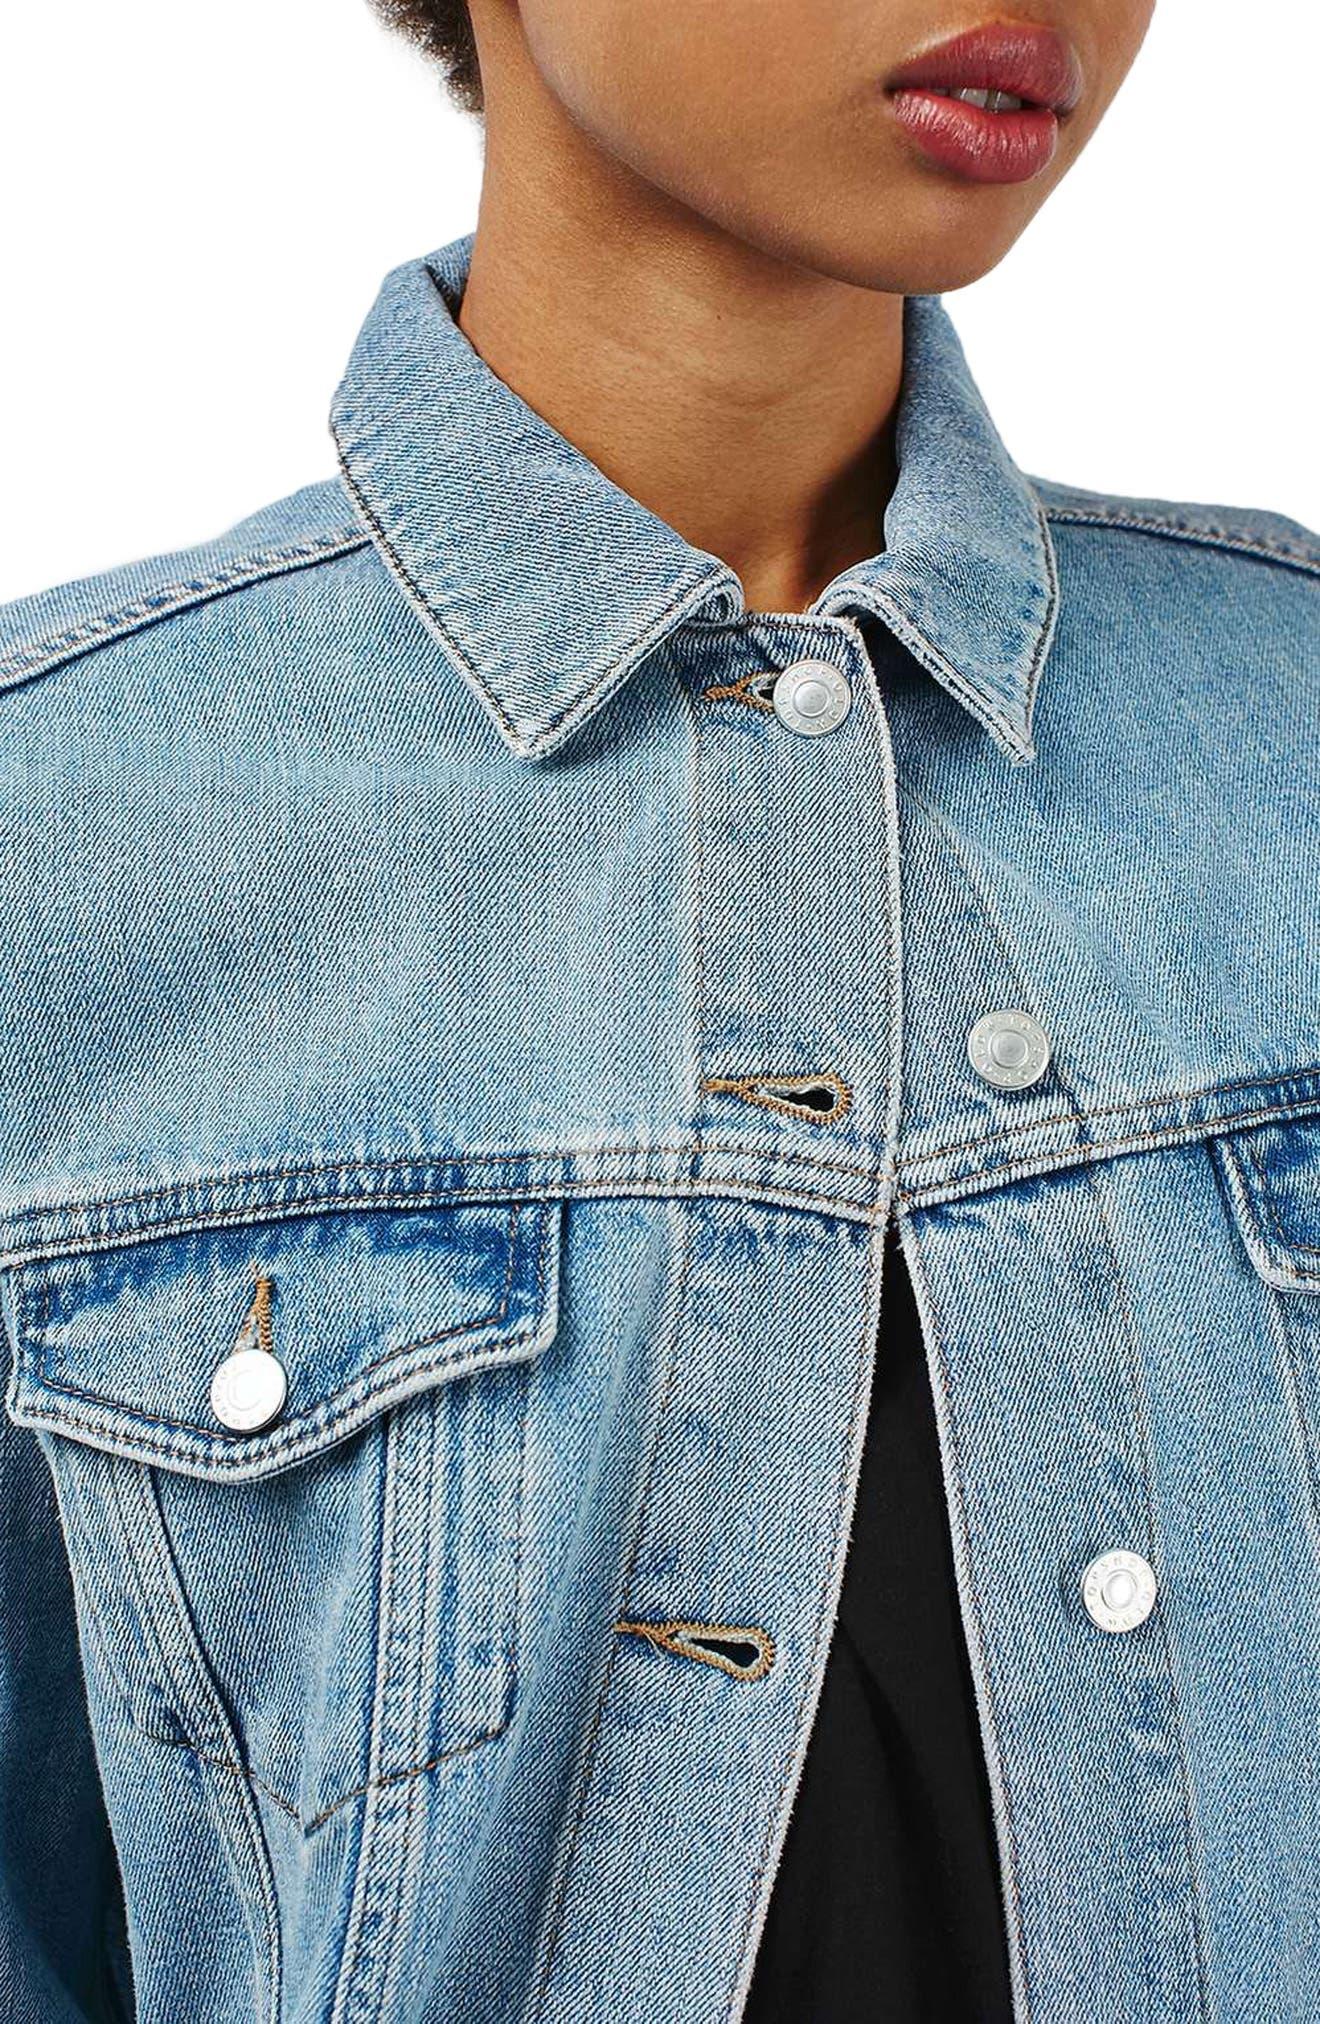 Longline Denim Jacket,                             Alternate thumbnail 3, color,                             400